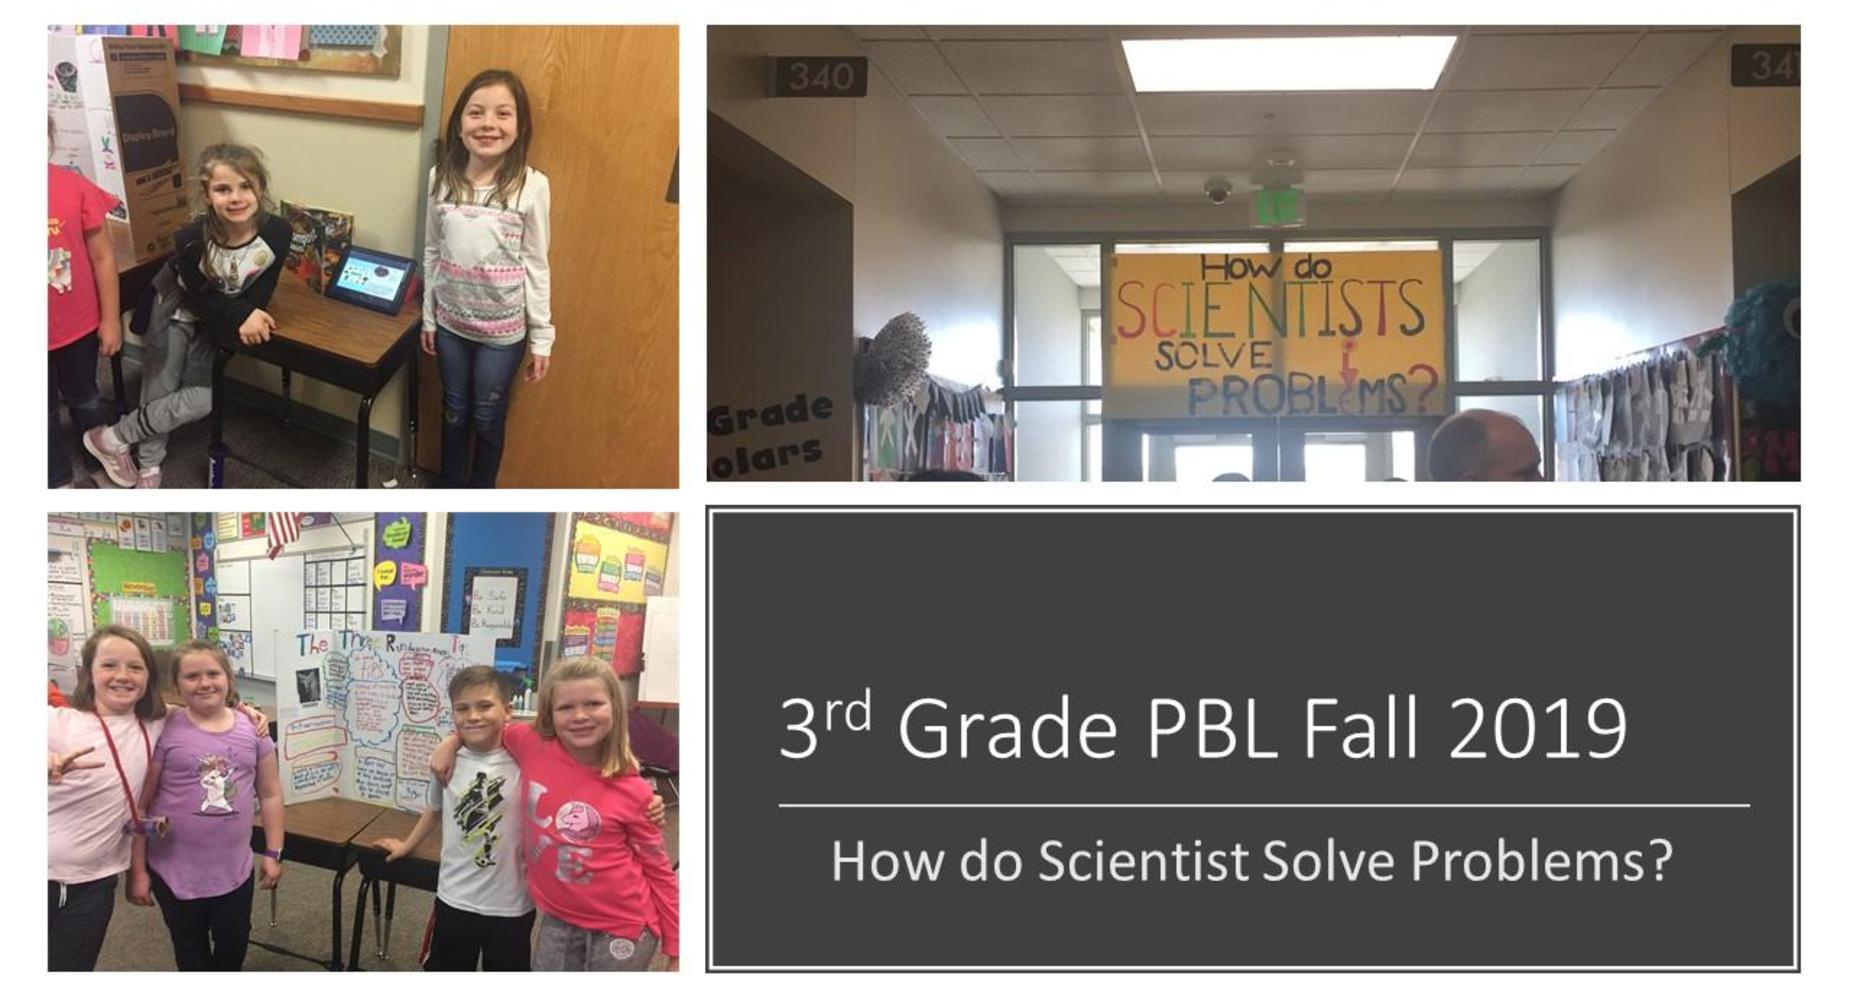 3rd grade PBL